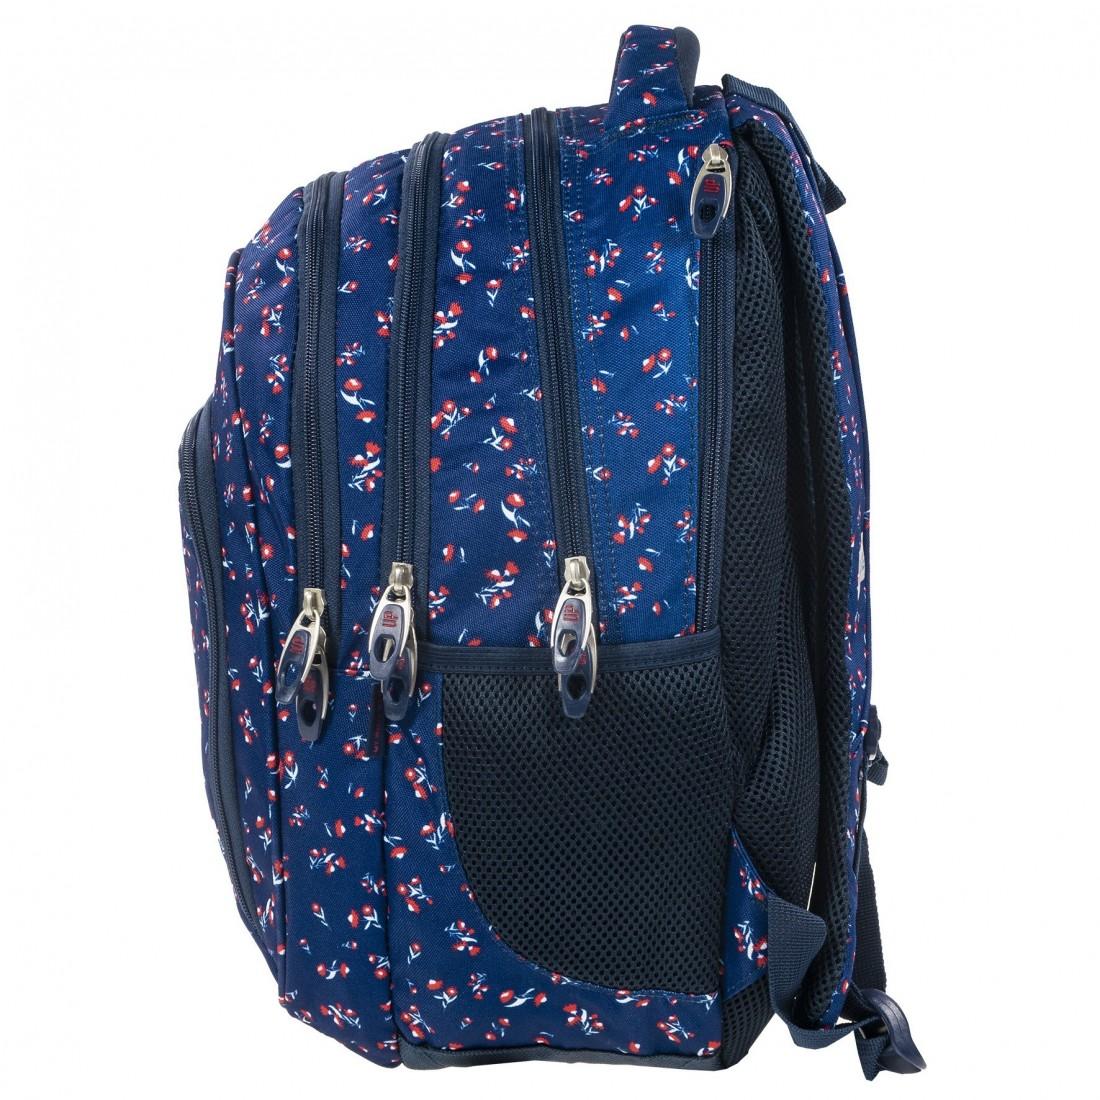 d17cfb1a771fe ... Plecak szkolny drobne kwiatuszki + GRATIS słuchawki BackUP D 26. Obniżka